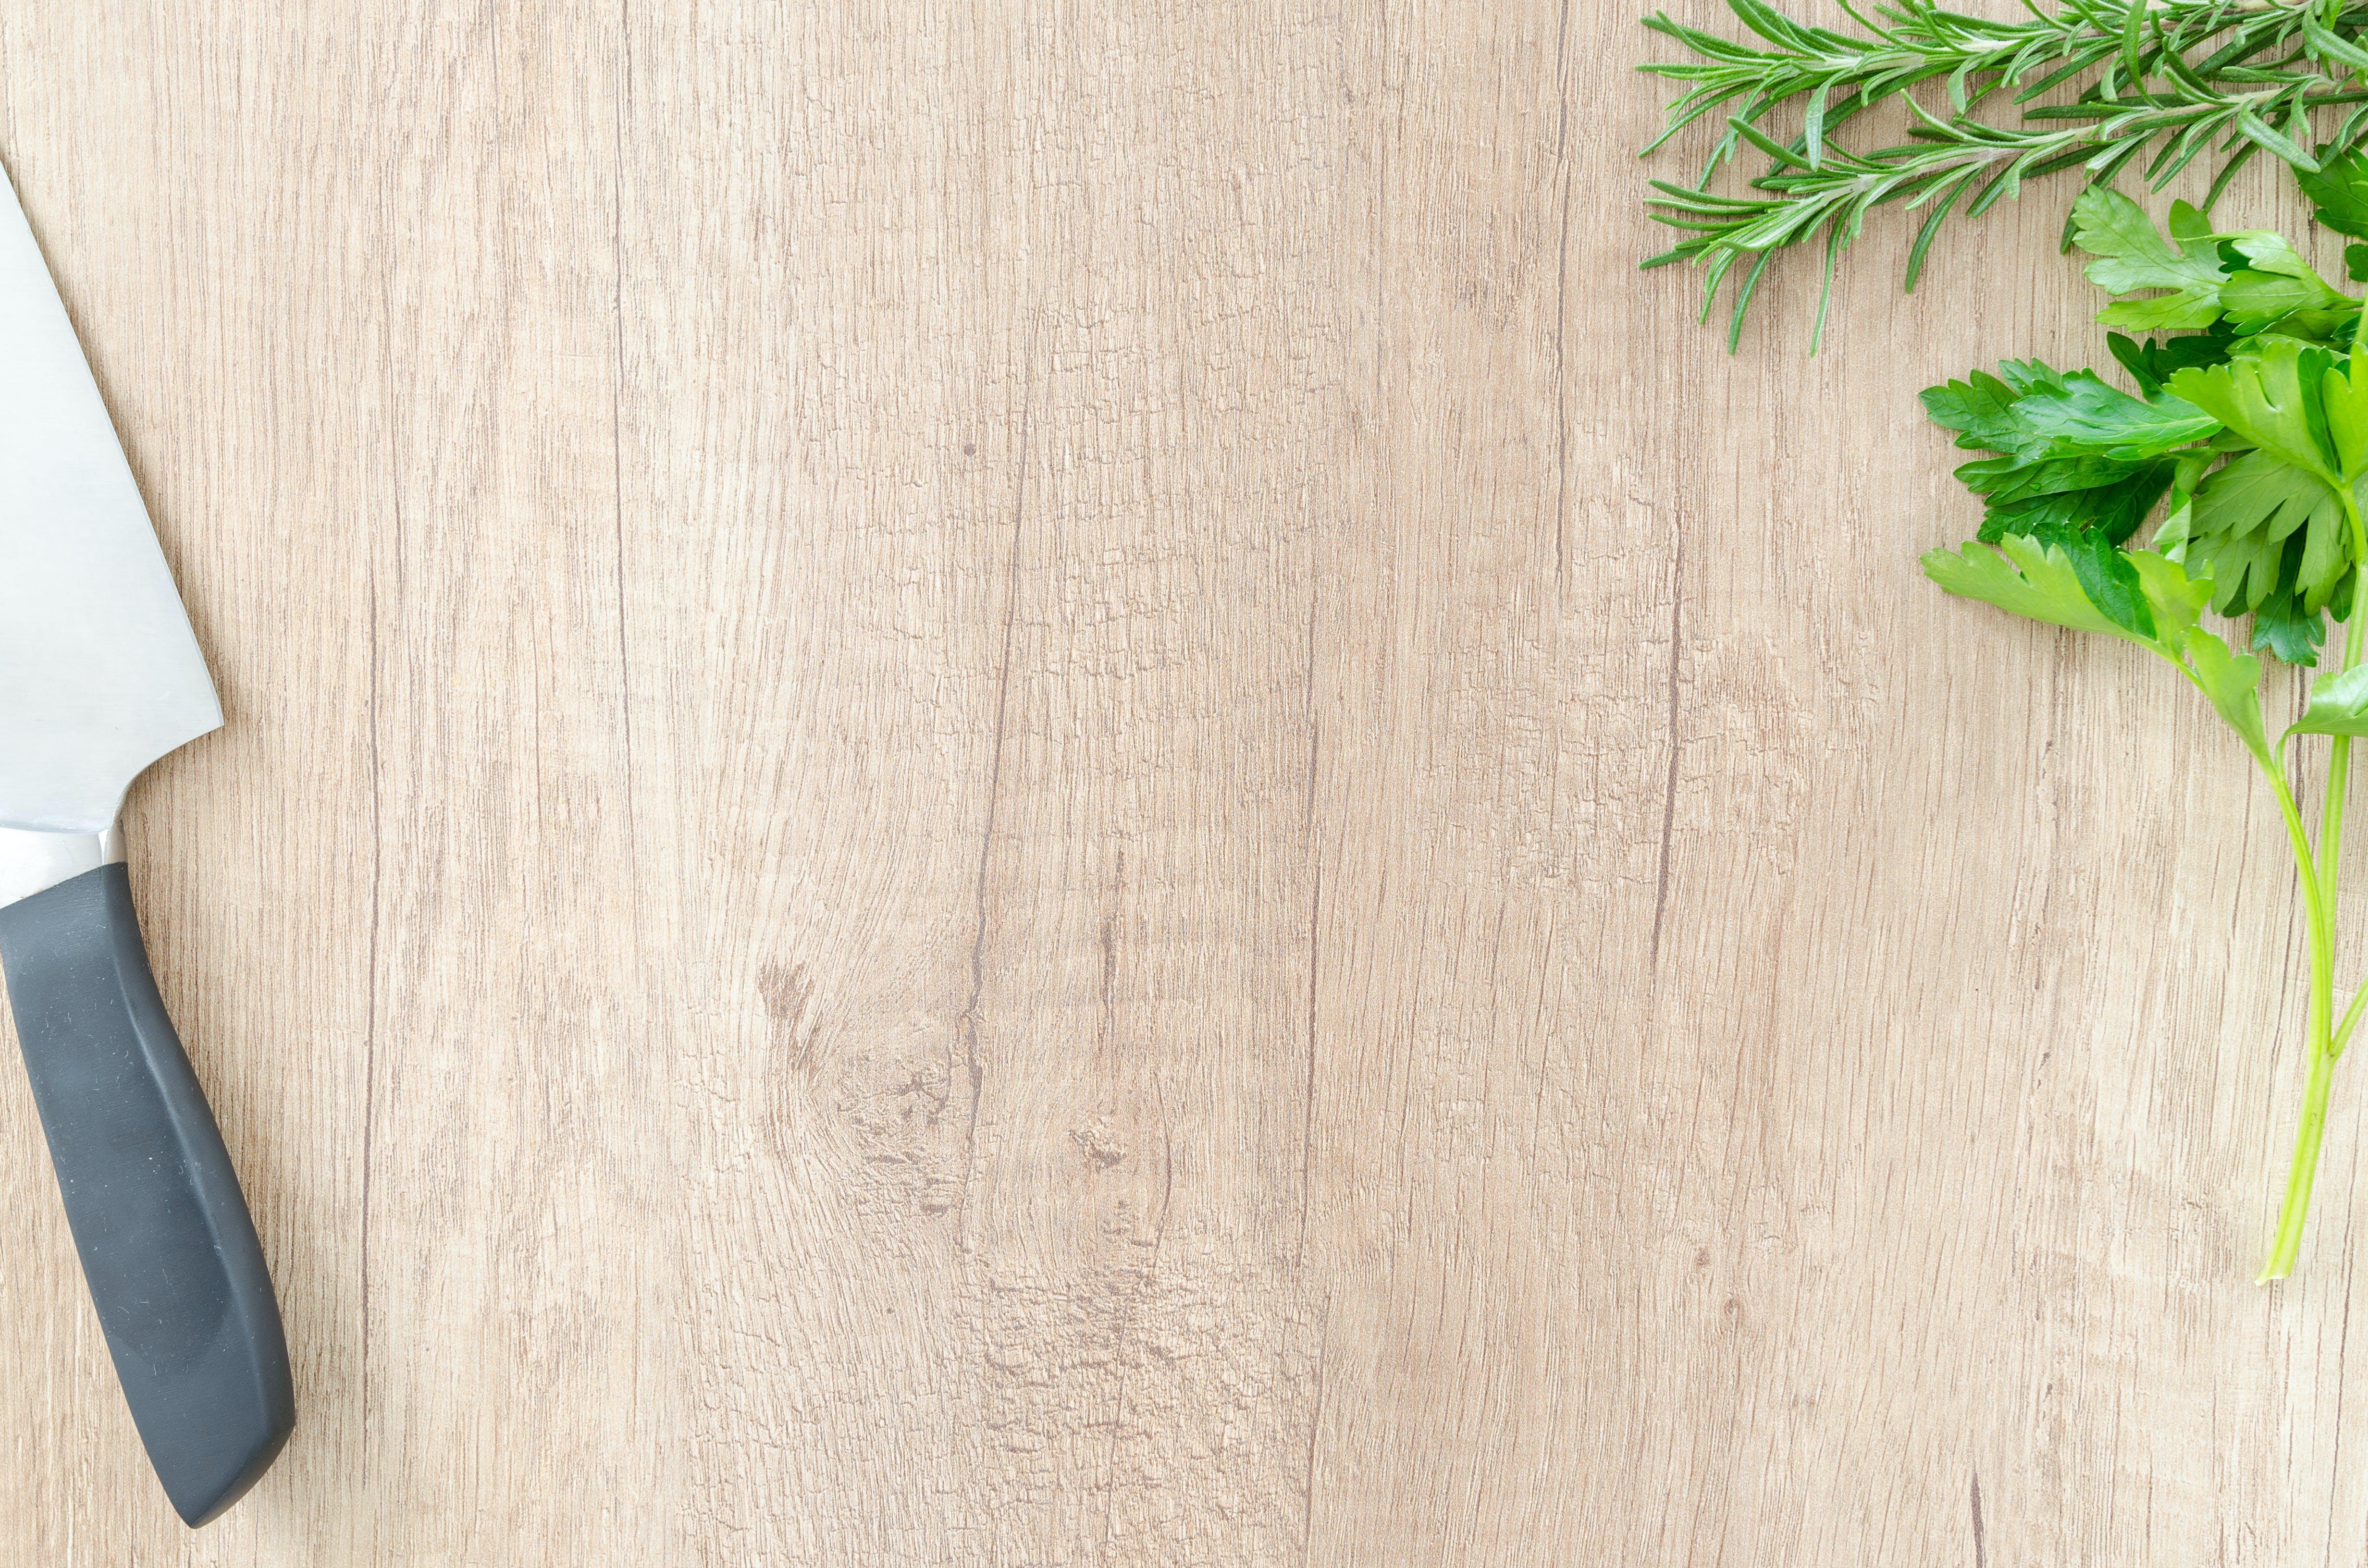 Free stock photo of food, healthy, wood, menu